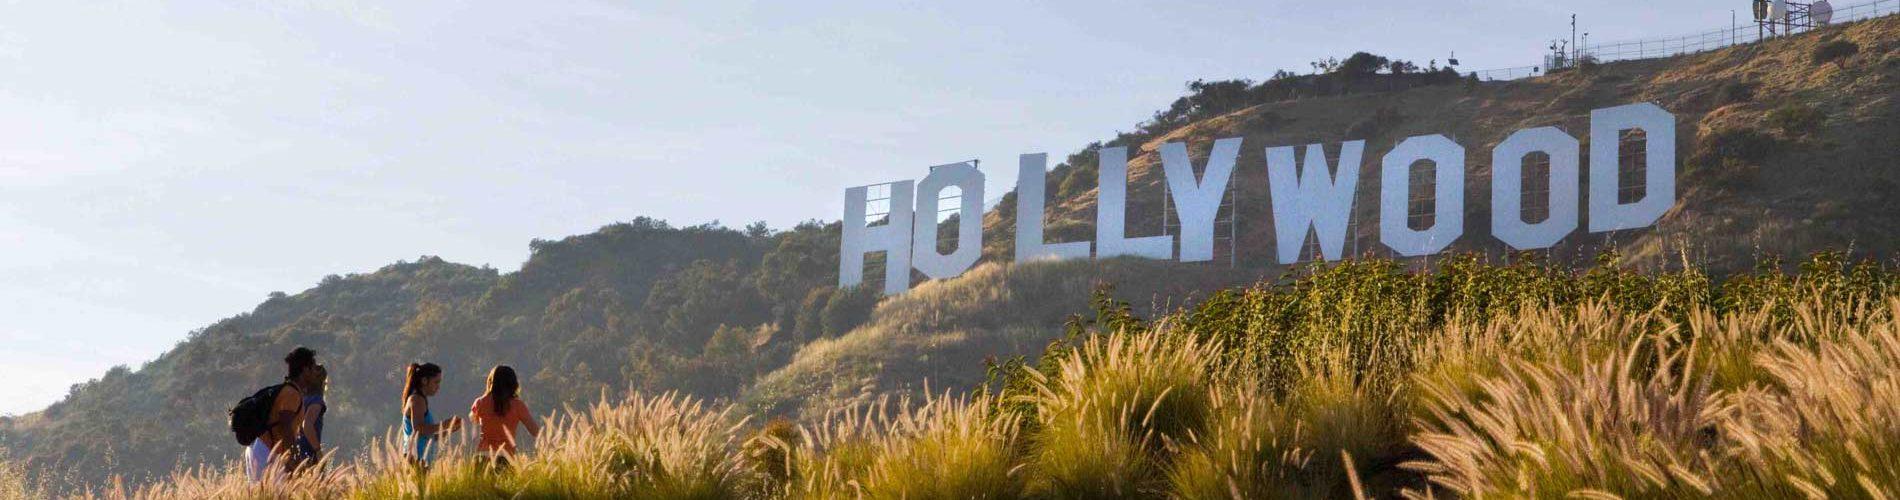 vip hollywood